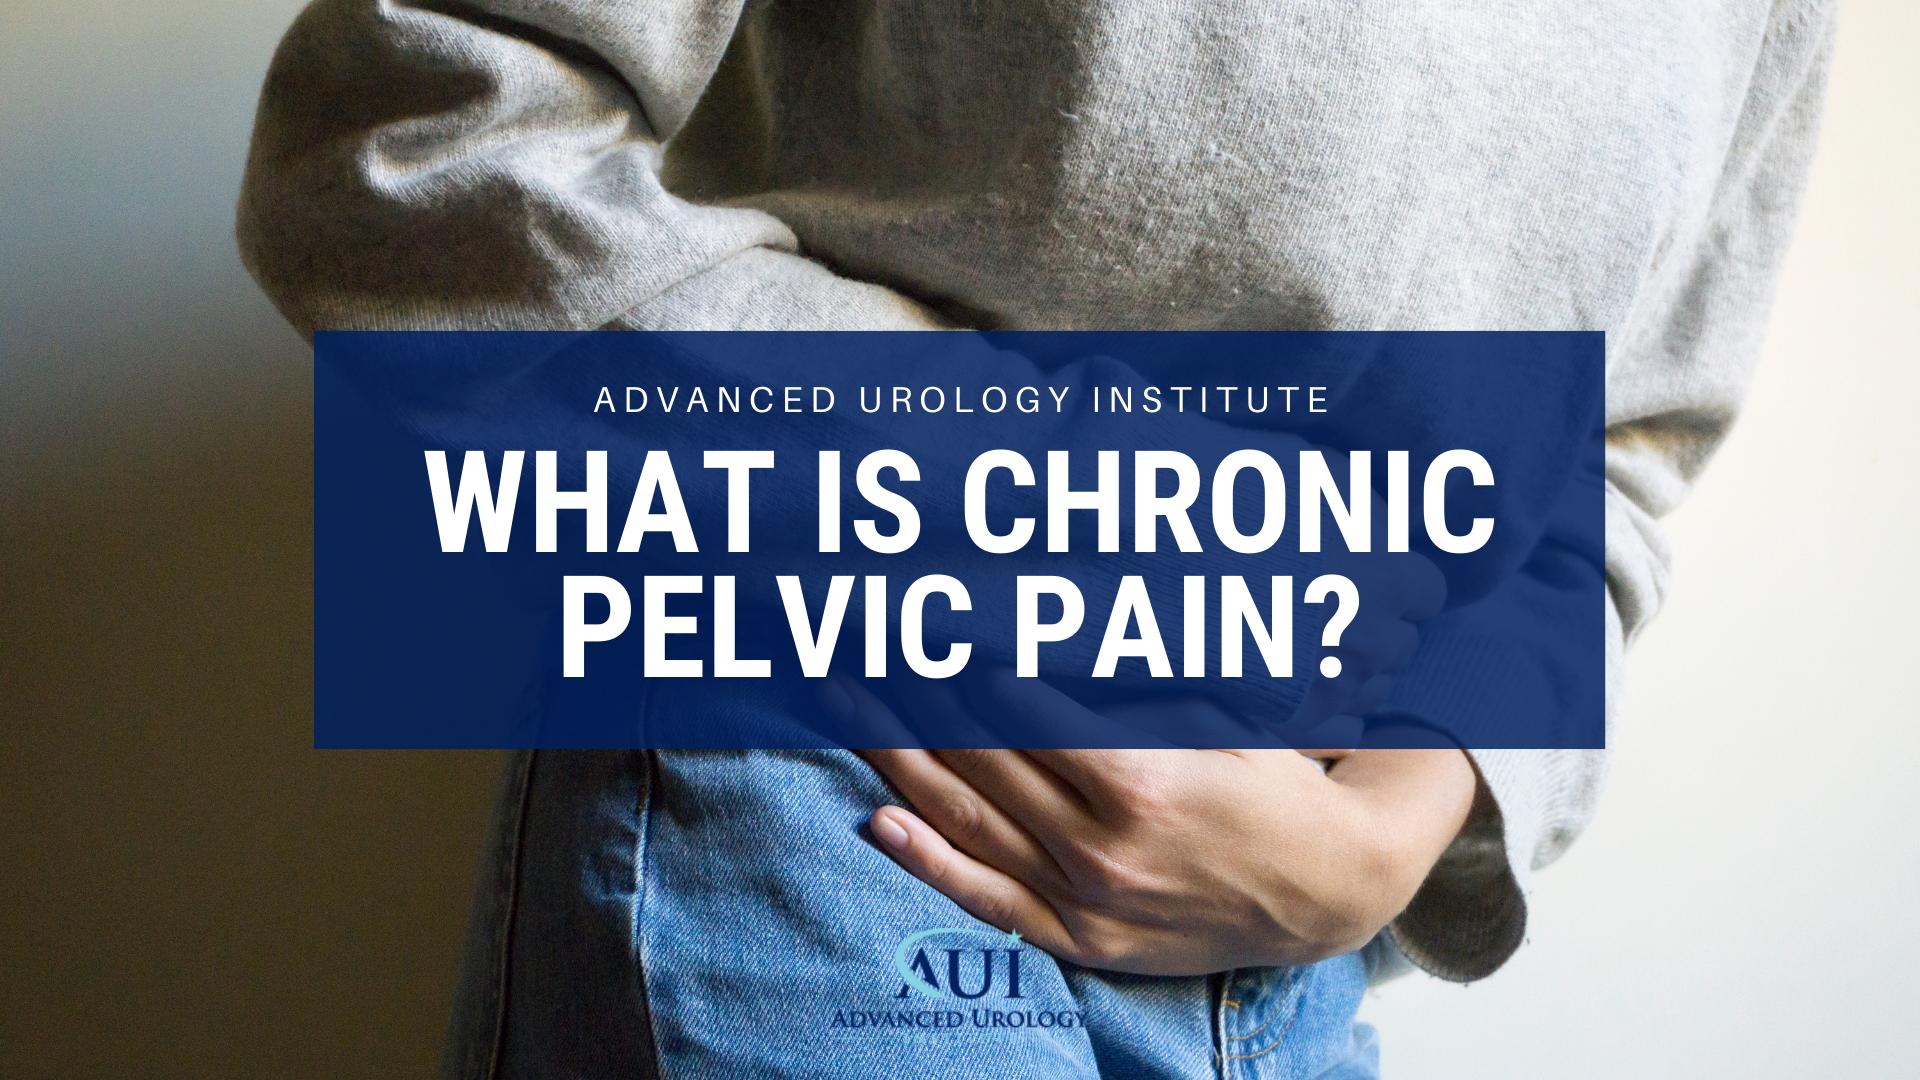 What is chronic pelvic pain?